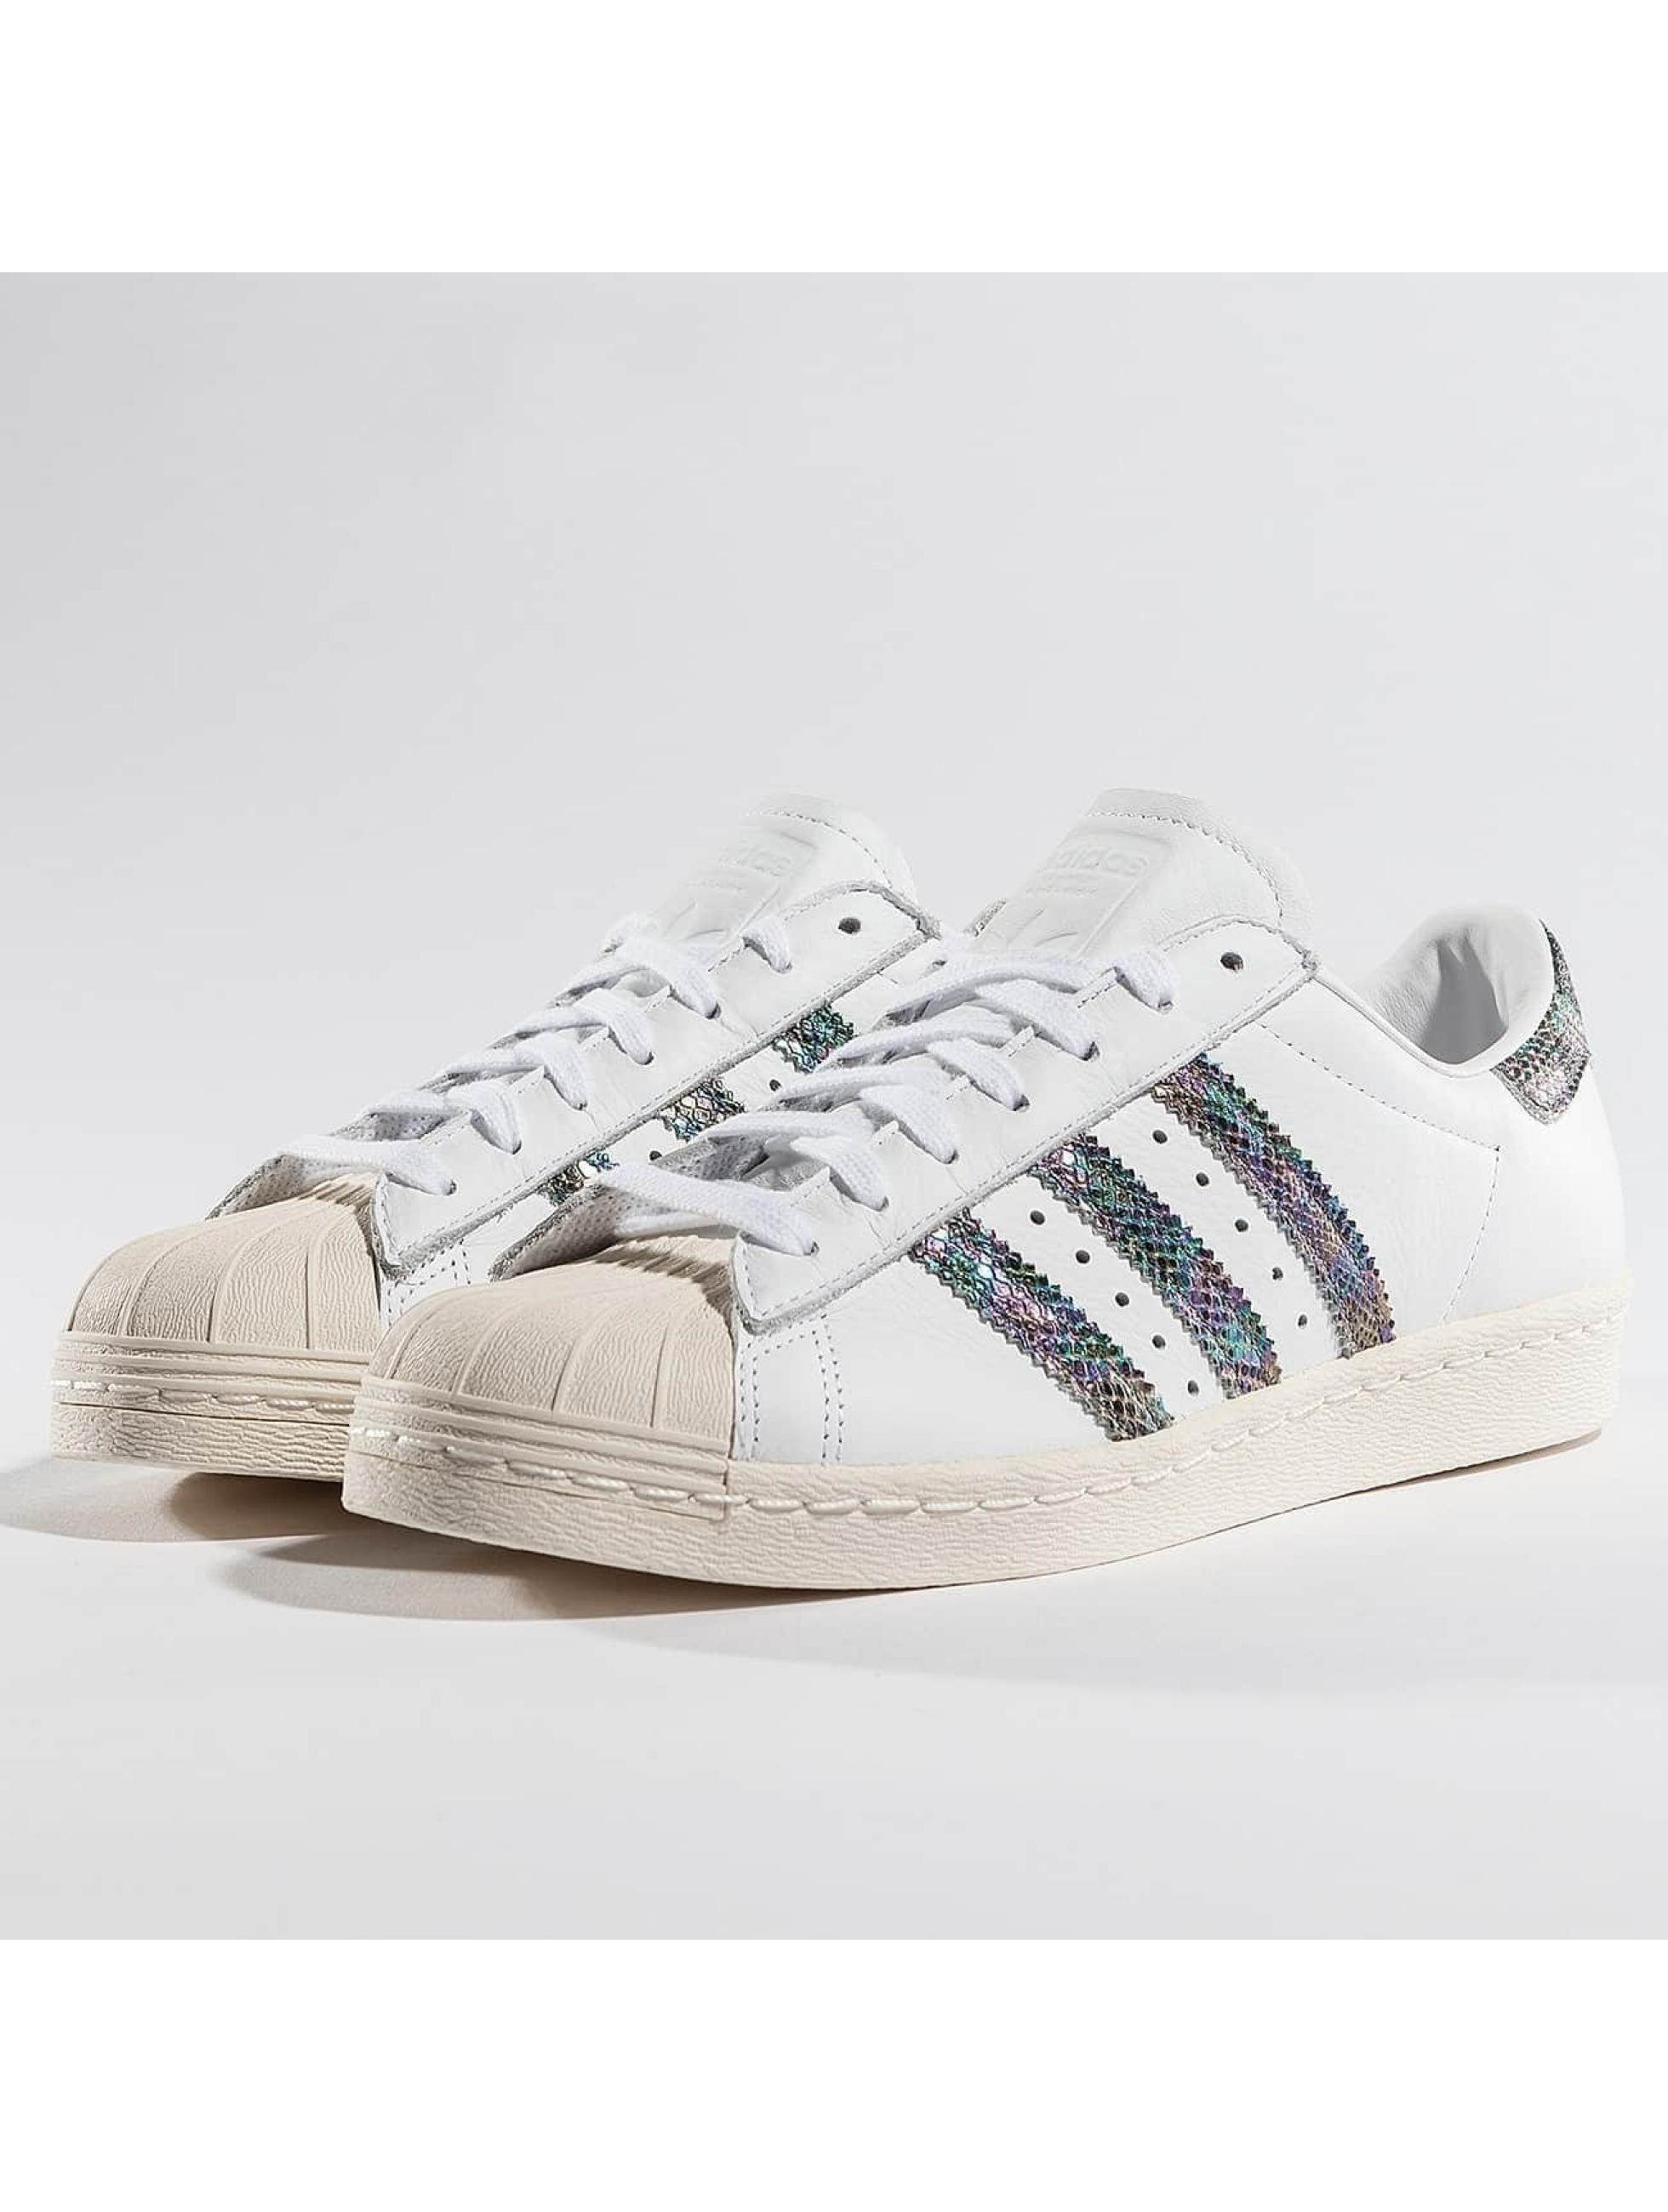 sports shoes fcb71 98508 adidas Skor   Sneakers Superstar 80s i vit 360470